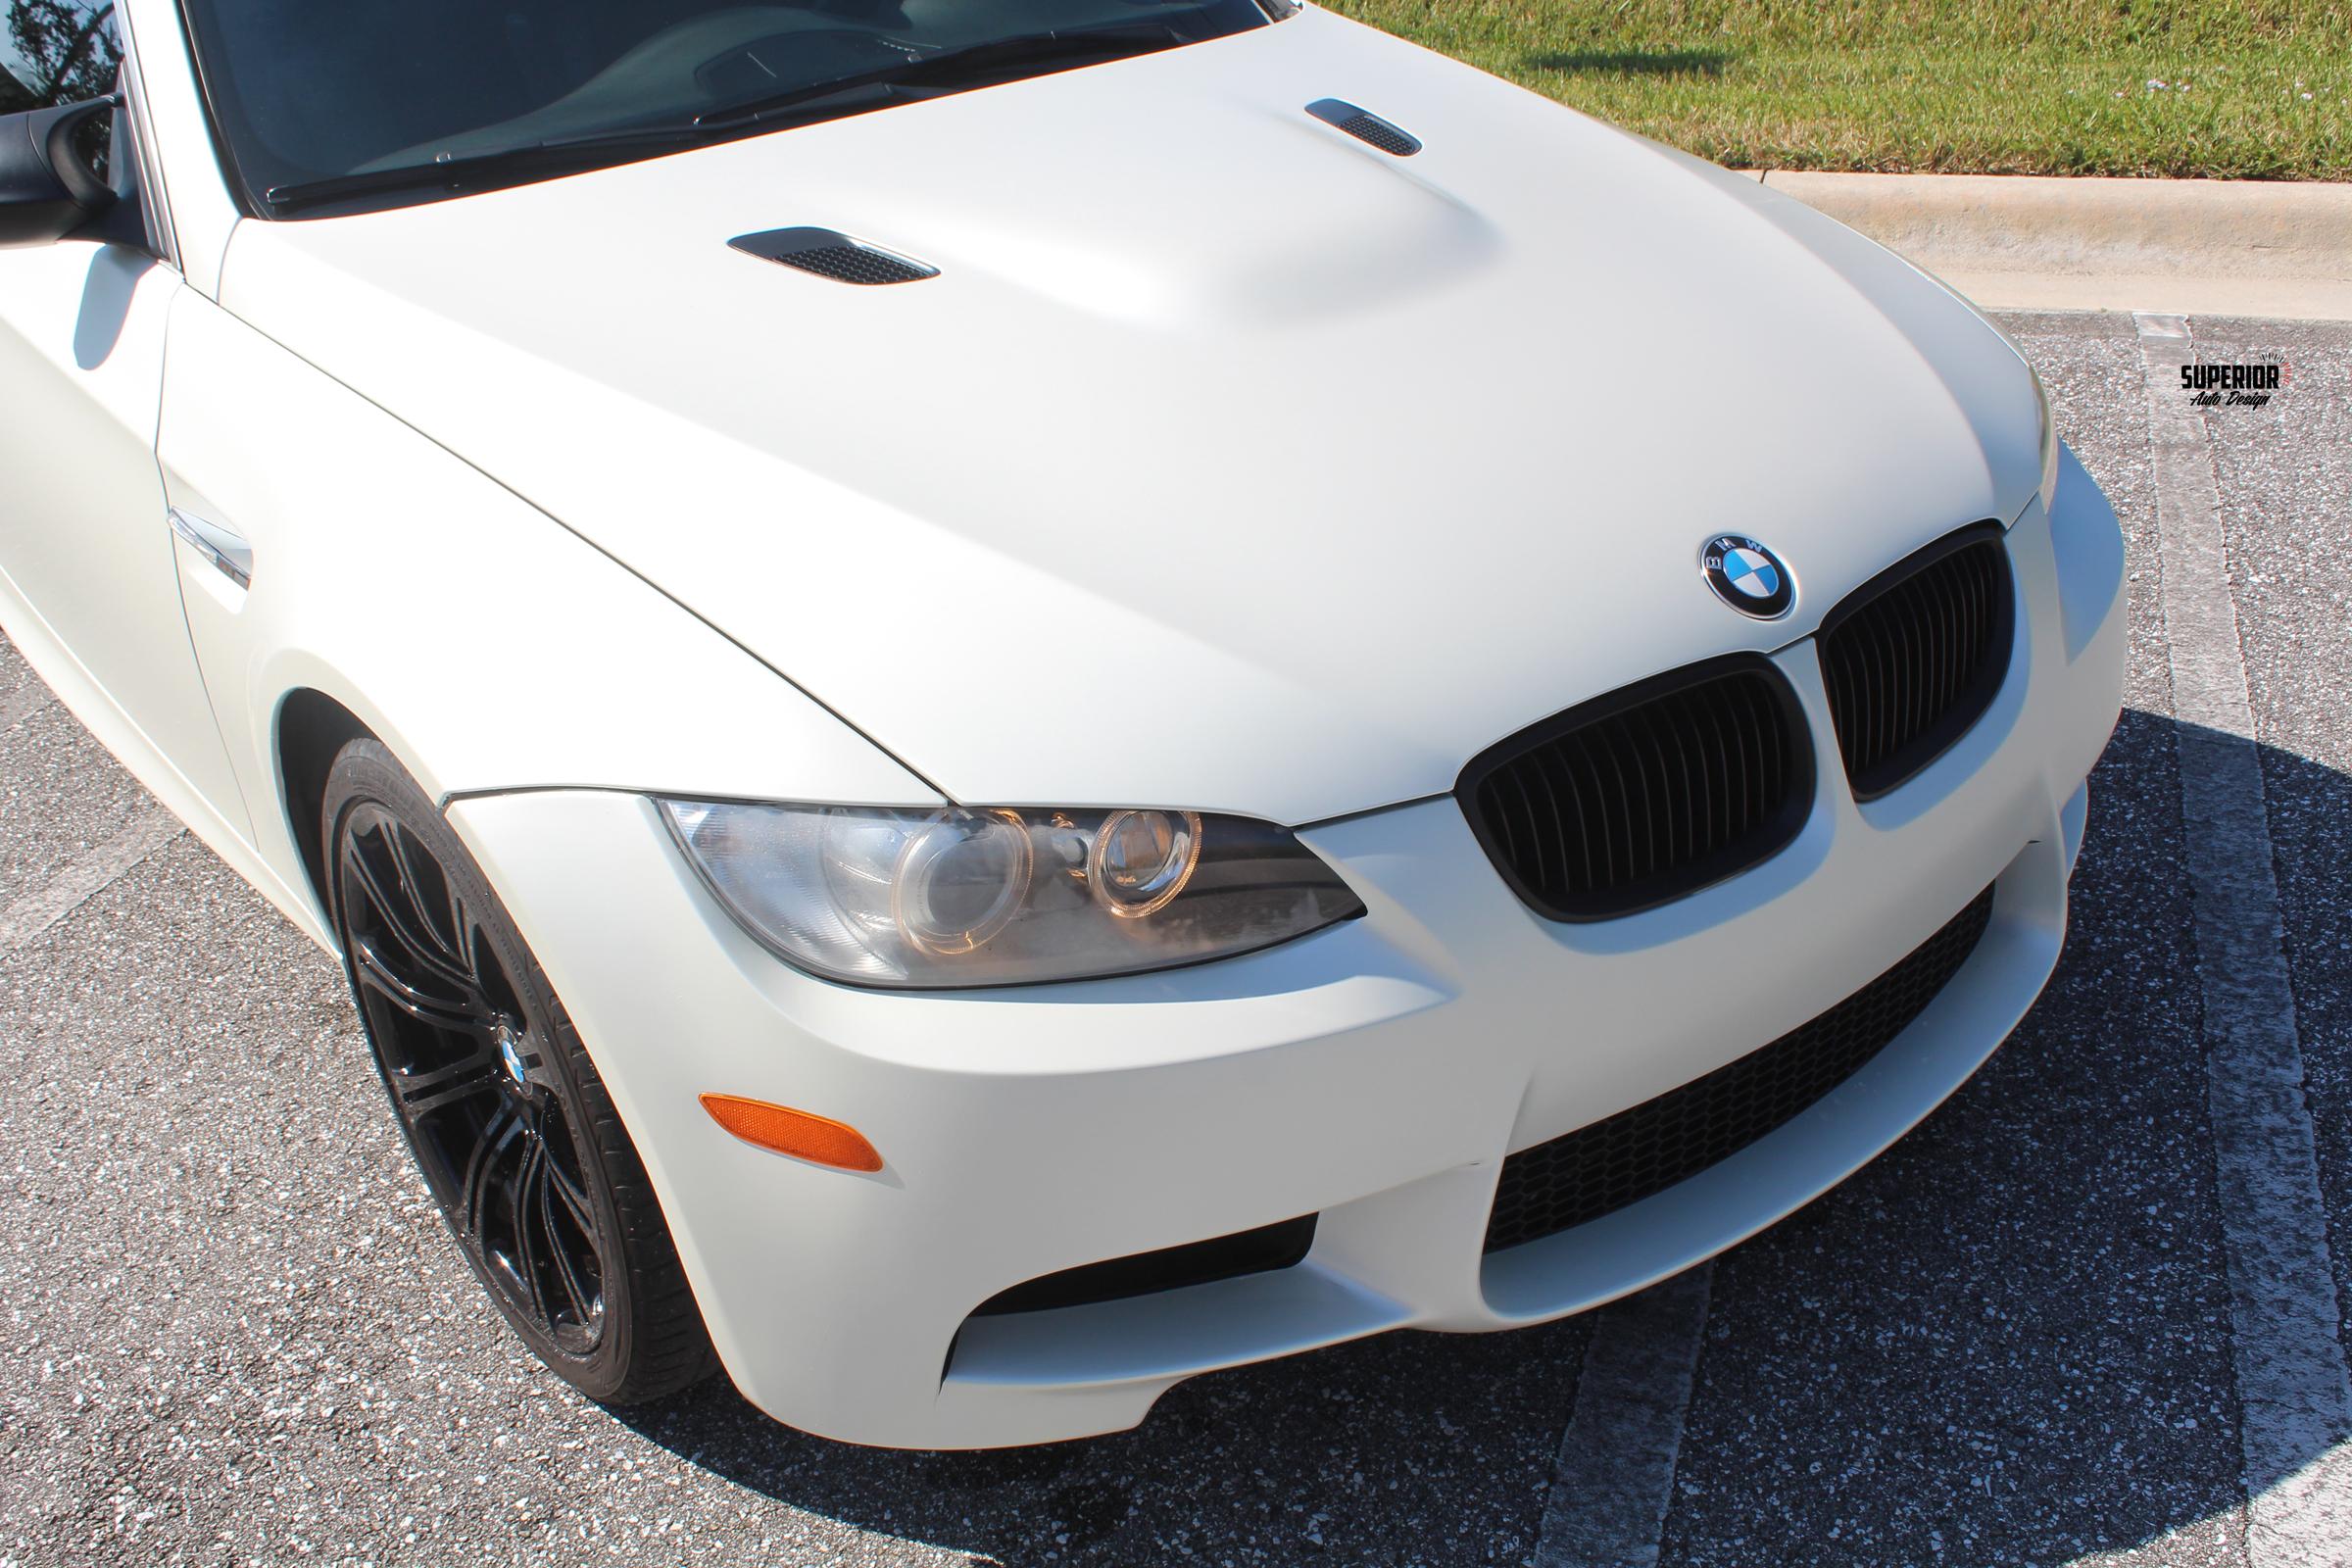 bmw-m3-satin-white-pearl-car-wrap-superior-auto-design-12